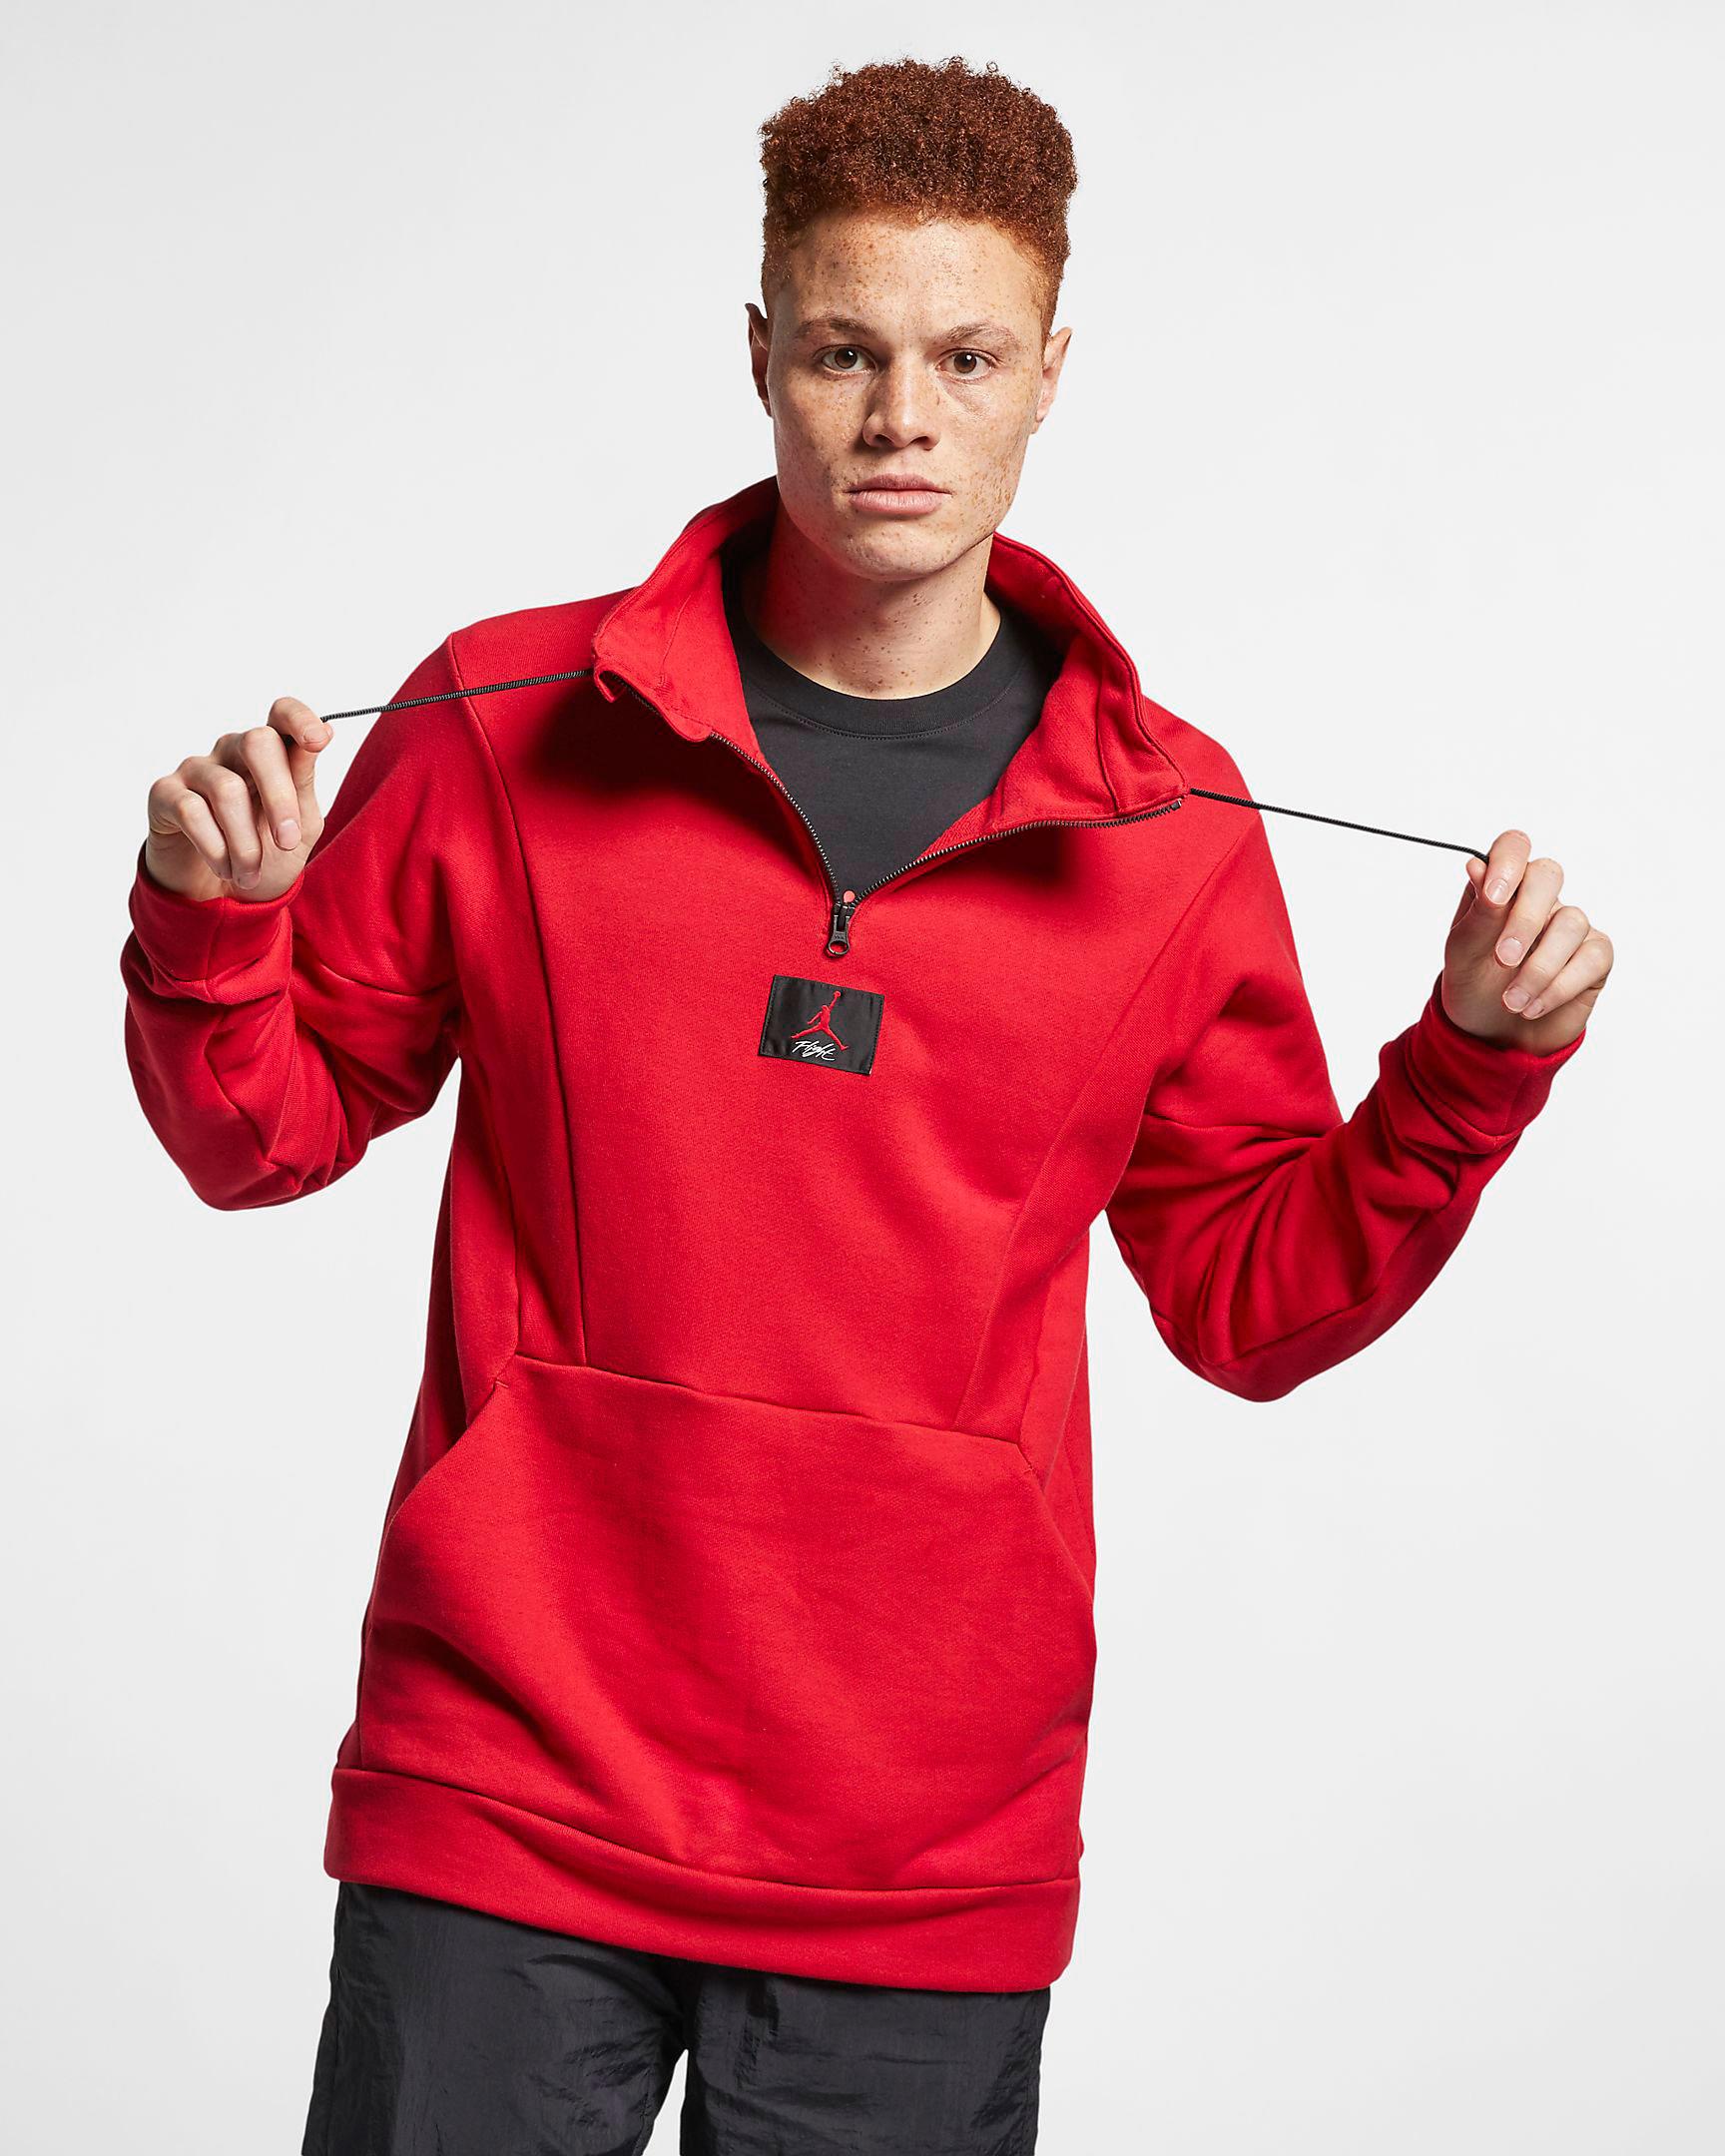 air-jordan-4-bred-sweatshirt-match-3